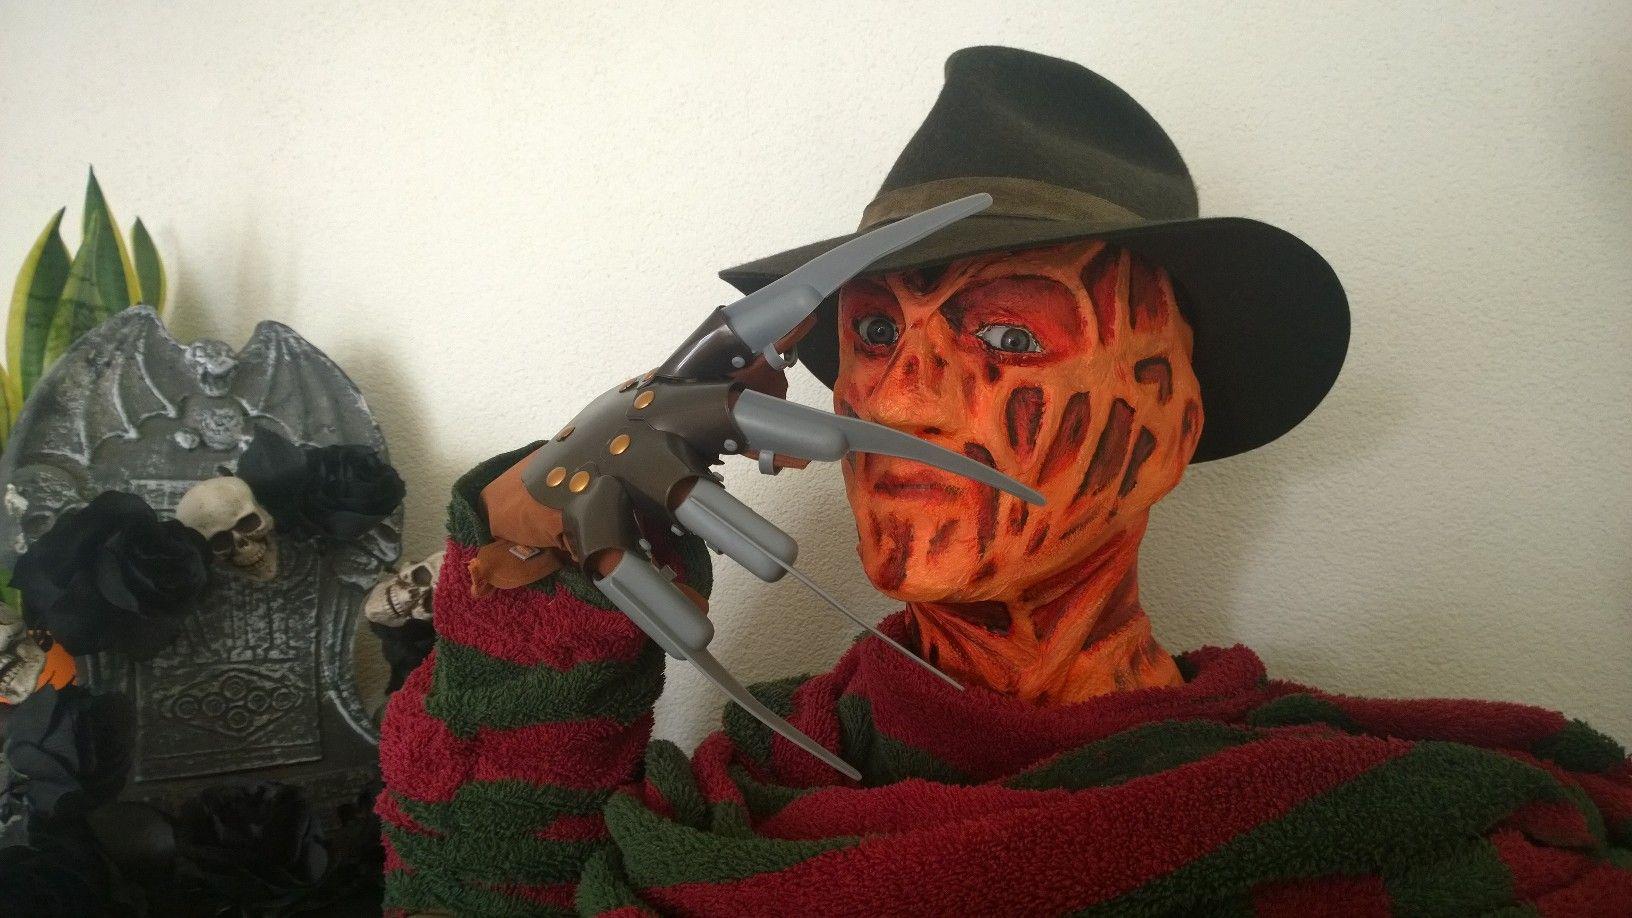 Creating Freddy Krueger with paper mache  https://www.youtube.com/watch?v=CstsjPrwePU